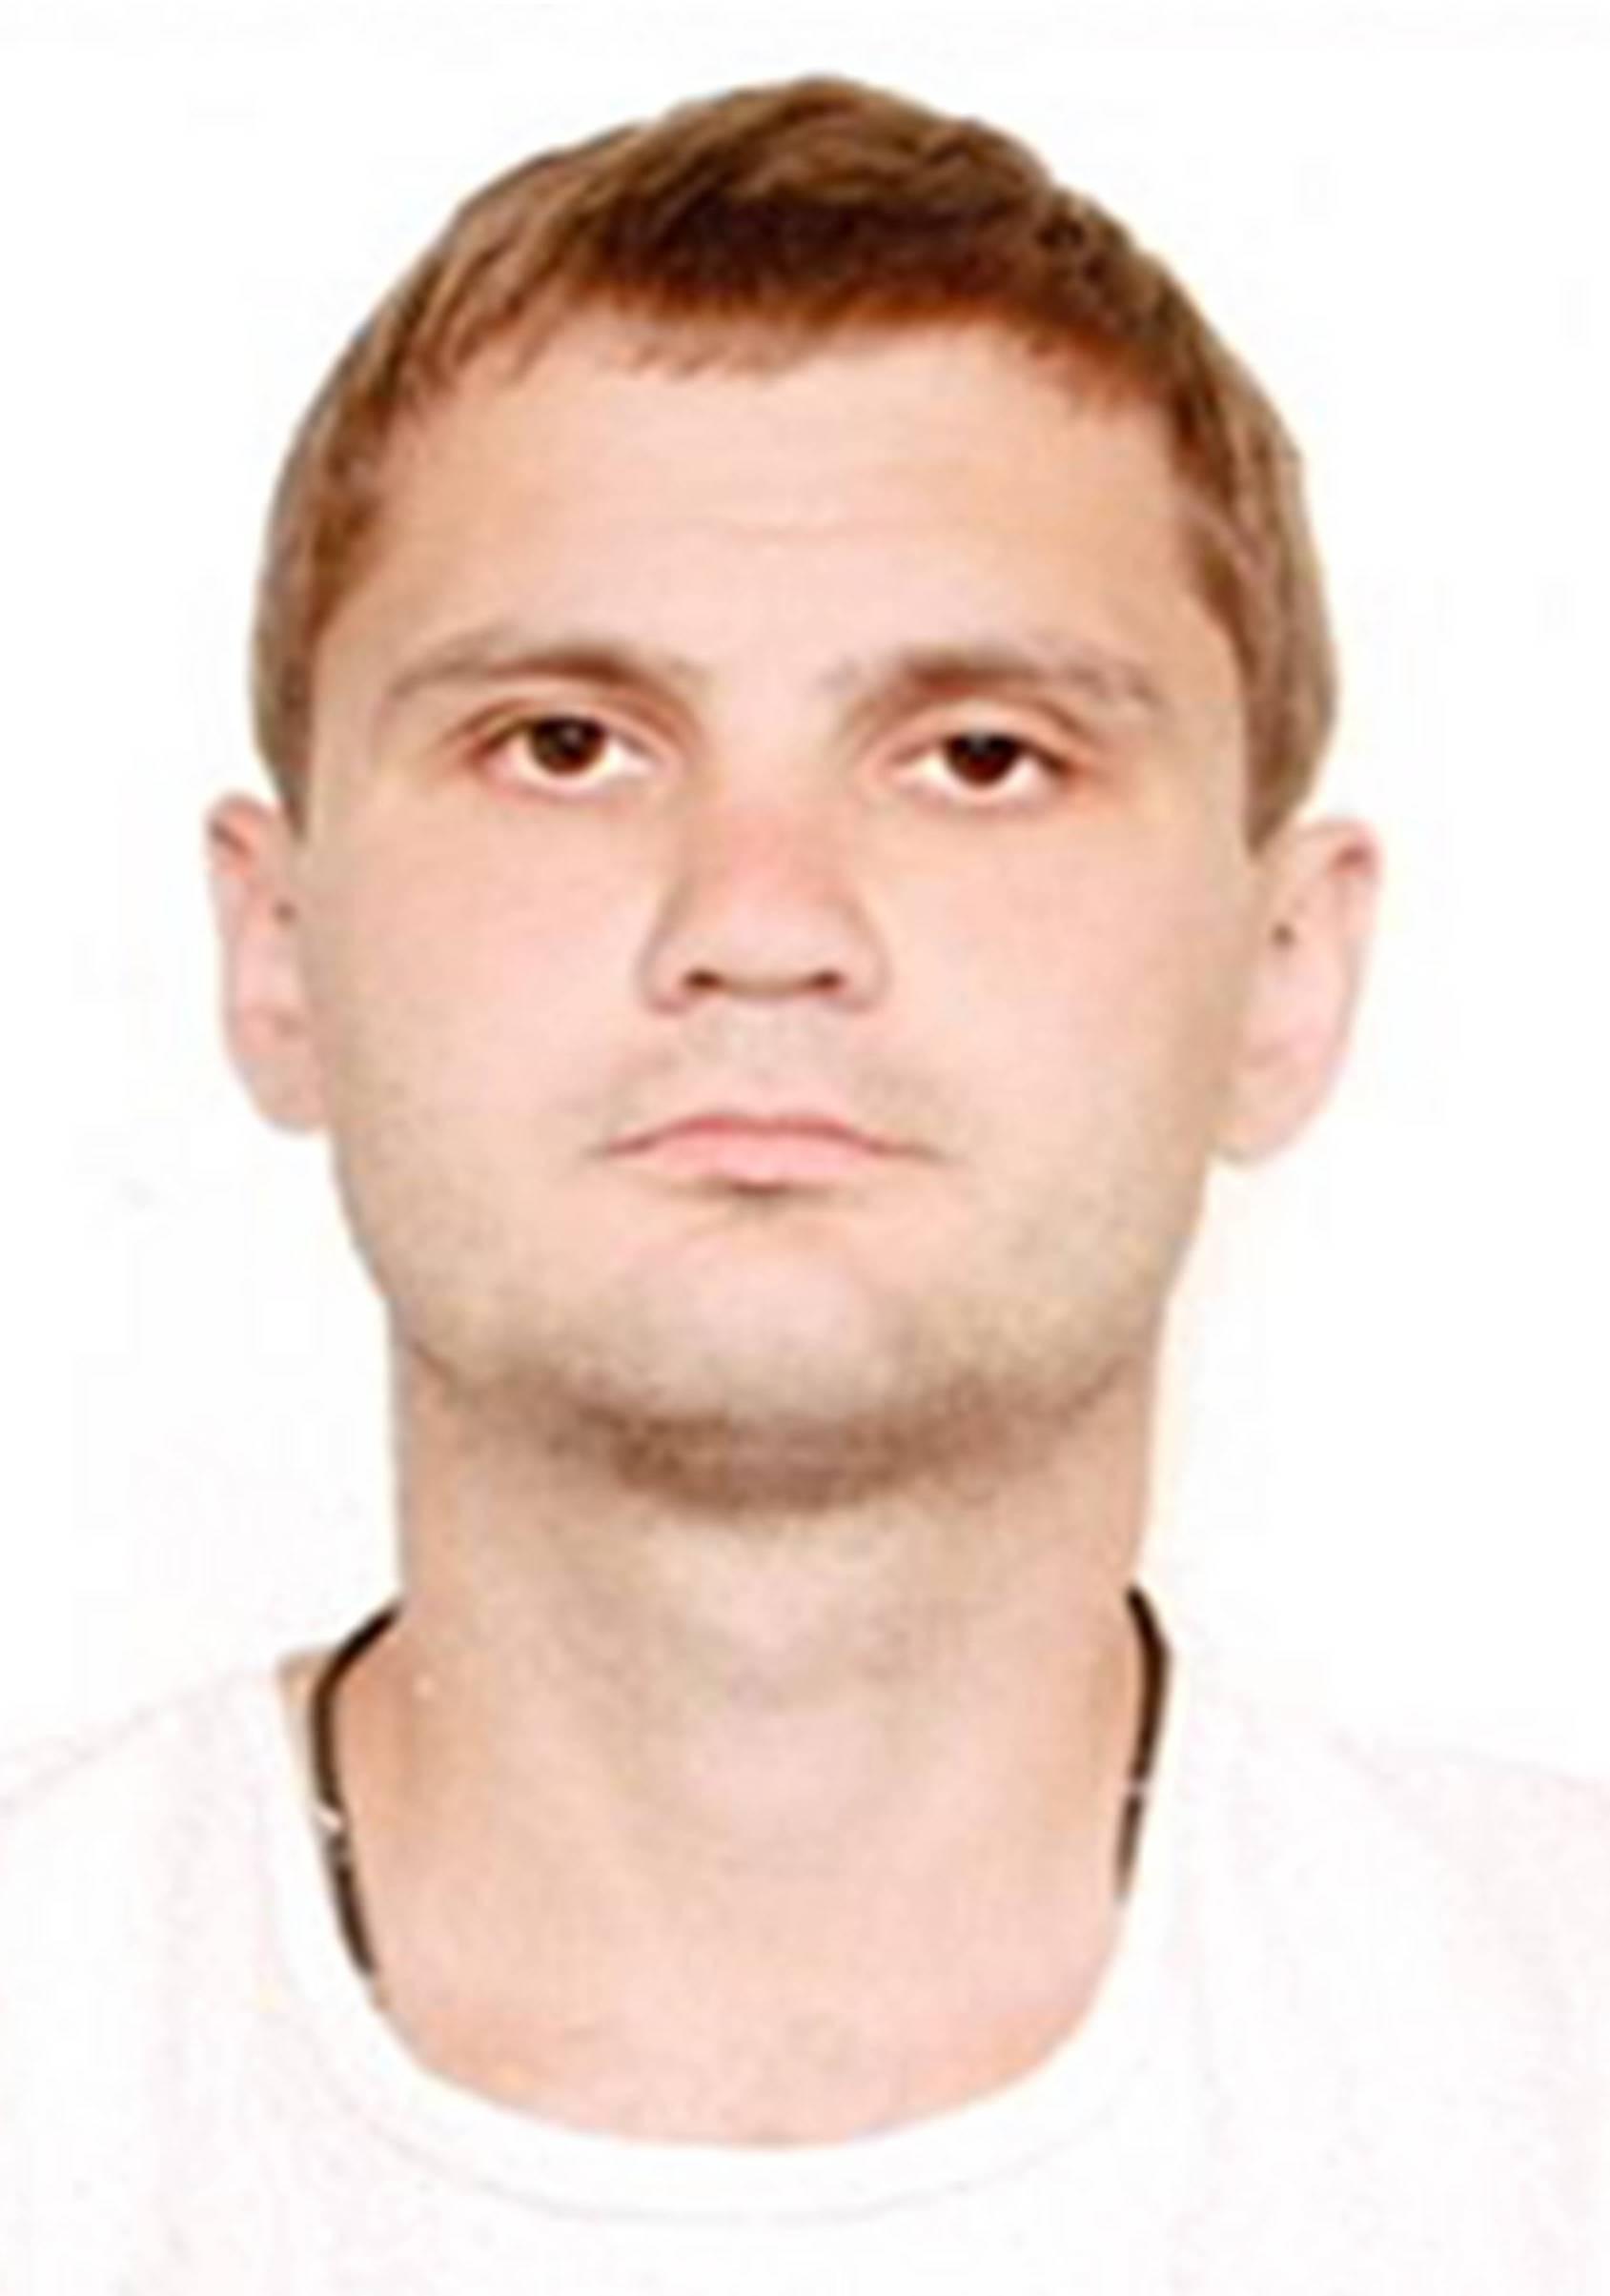 Polunytskyi Oleksandr